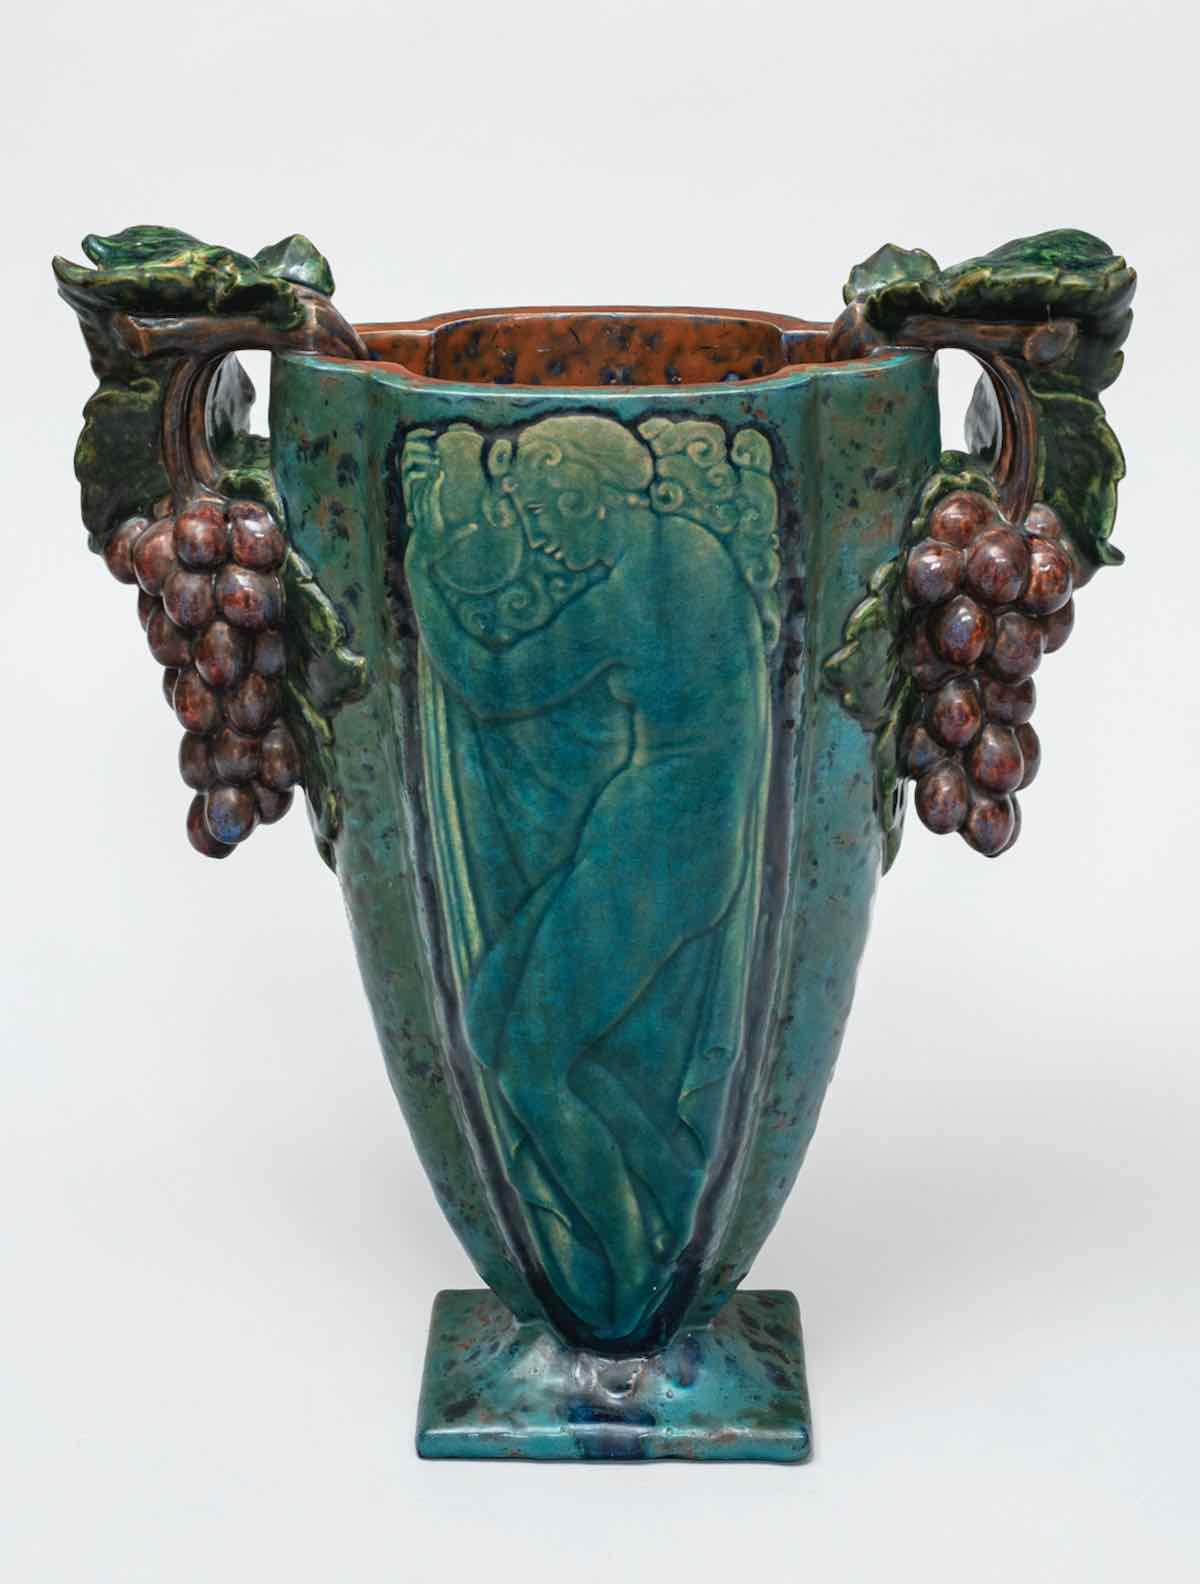 Vase avec anses en grappes de raisin - Richard Guino, c. 1920